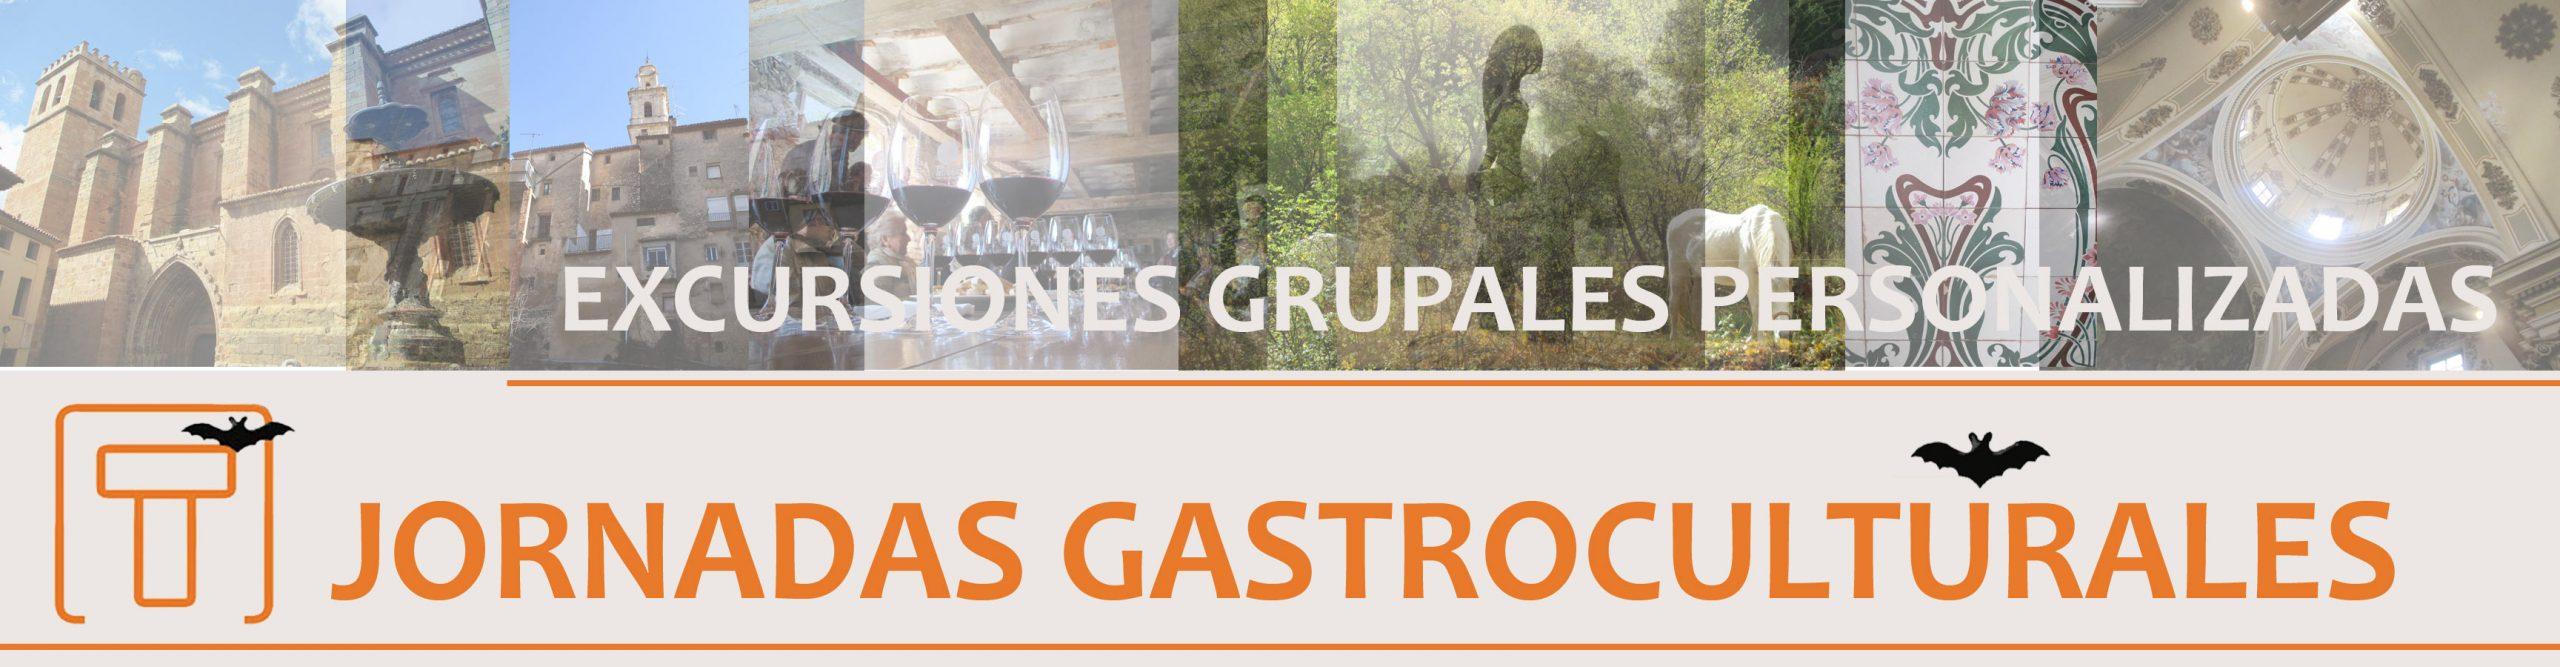 Jornadas-gastroculturales-turismo cultural grupos adzucats